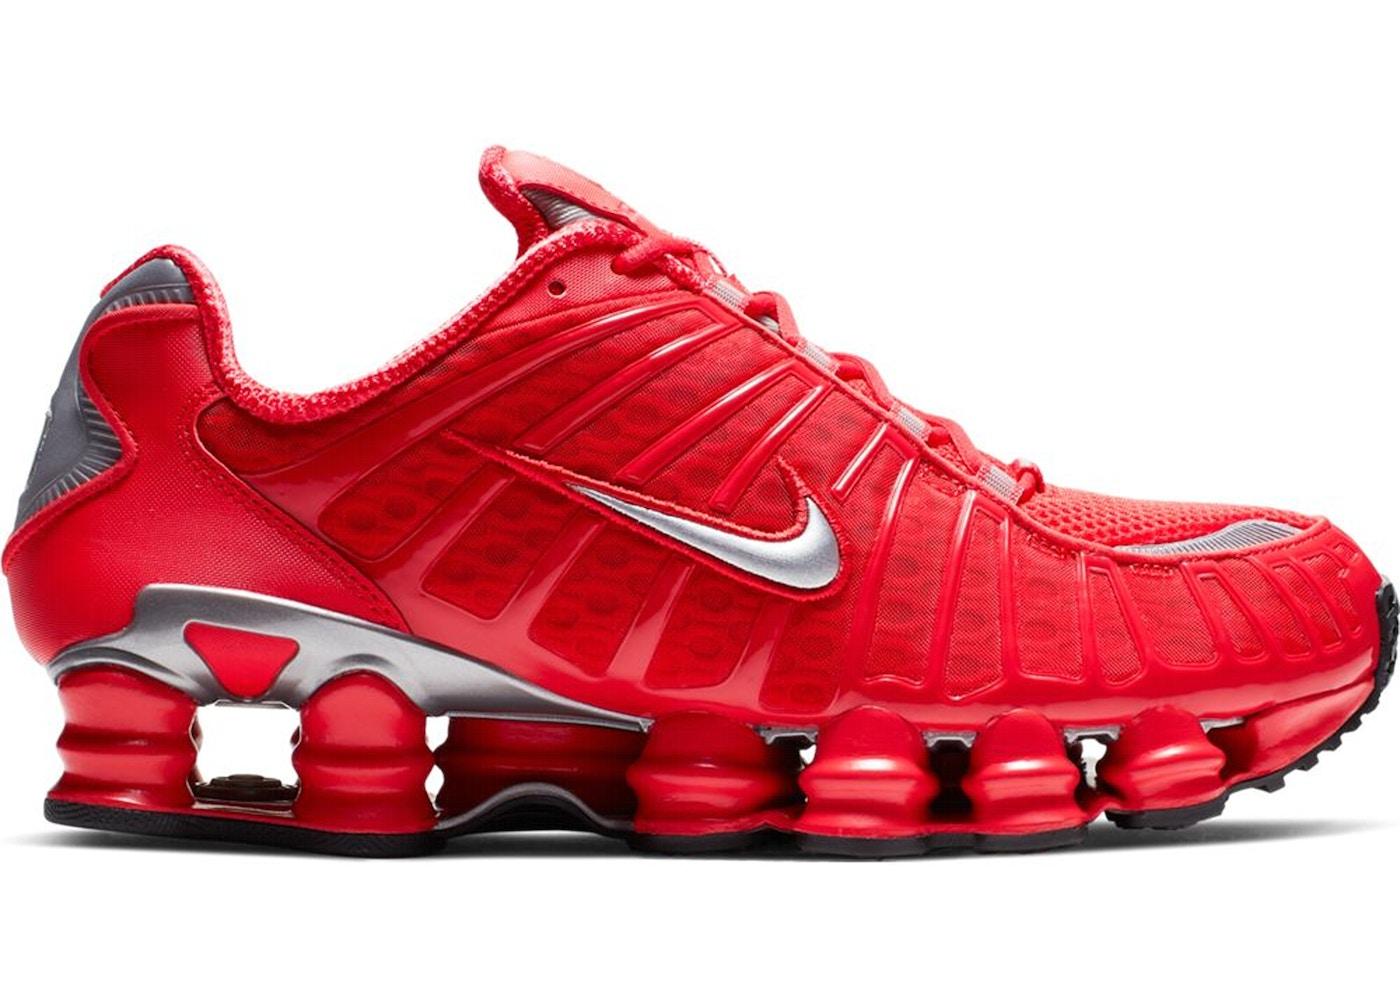 100% authentic b72d0 5b6b9 Nike Shox TL Speed Red